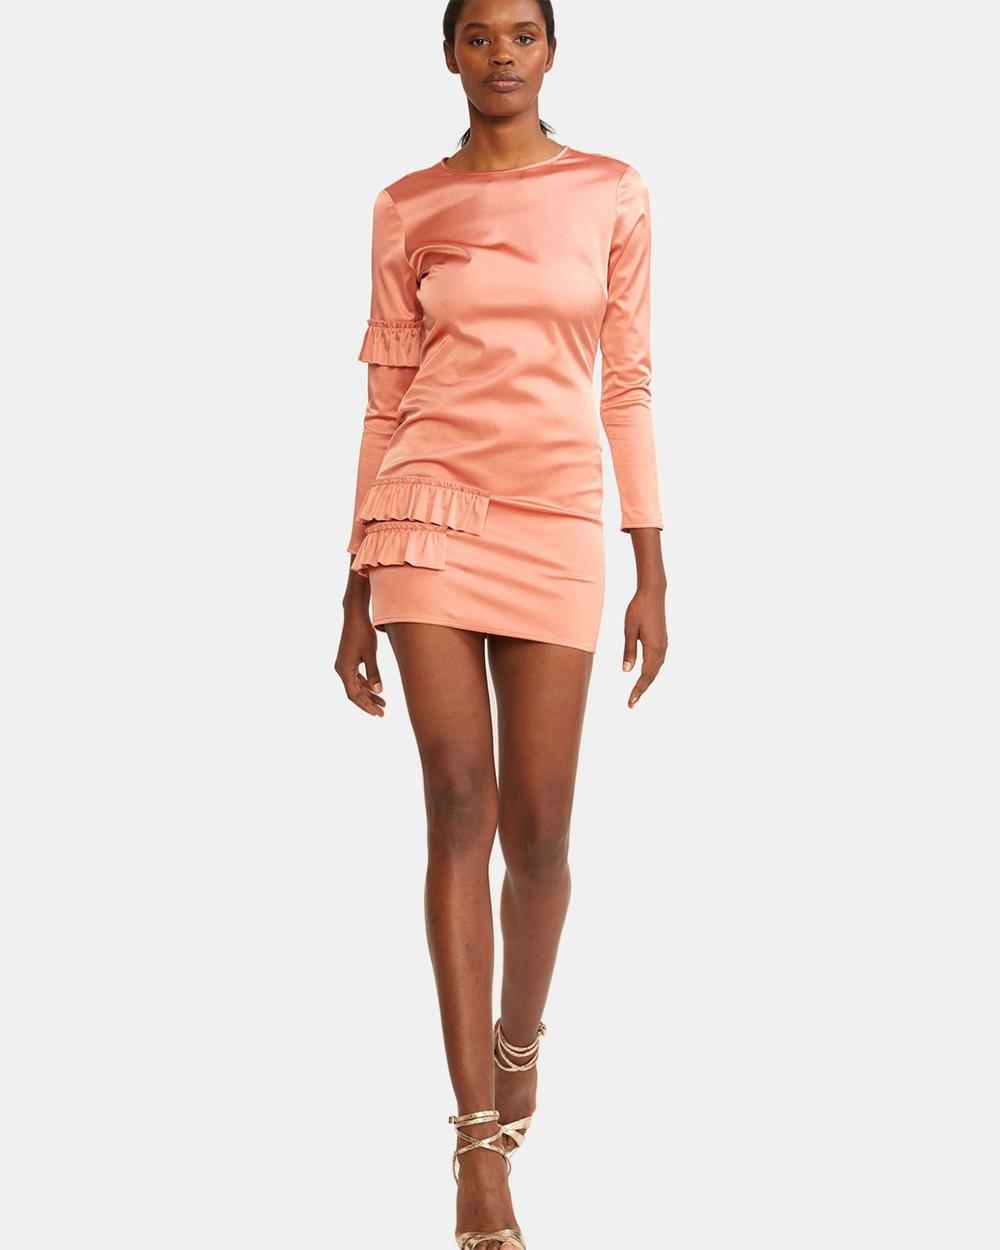 Cynthia Rowley Aeris Satin Ruffle Mini Dress Dresses Pink Aeris Satin Ruffle Mini Dress